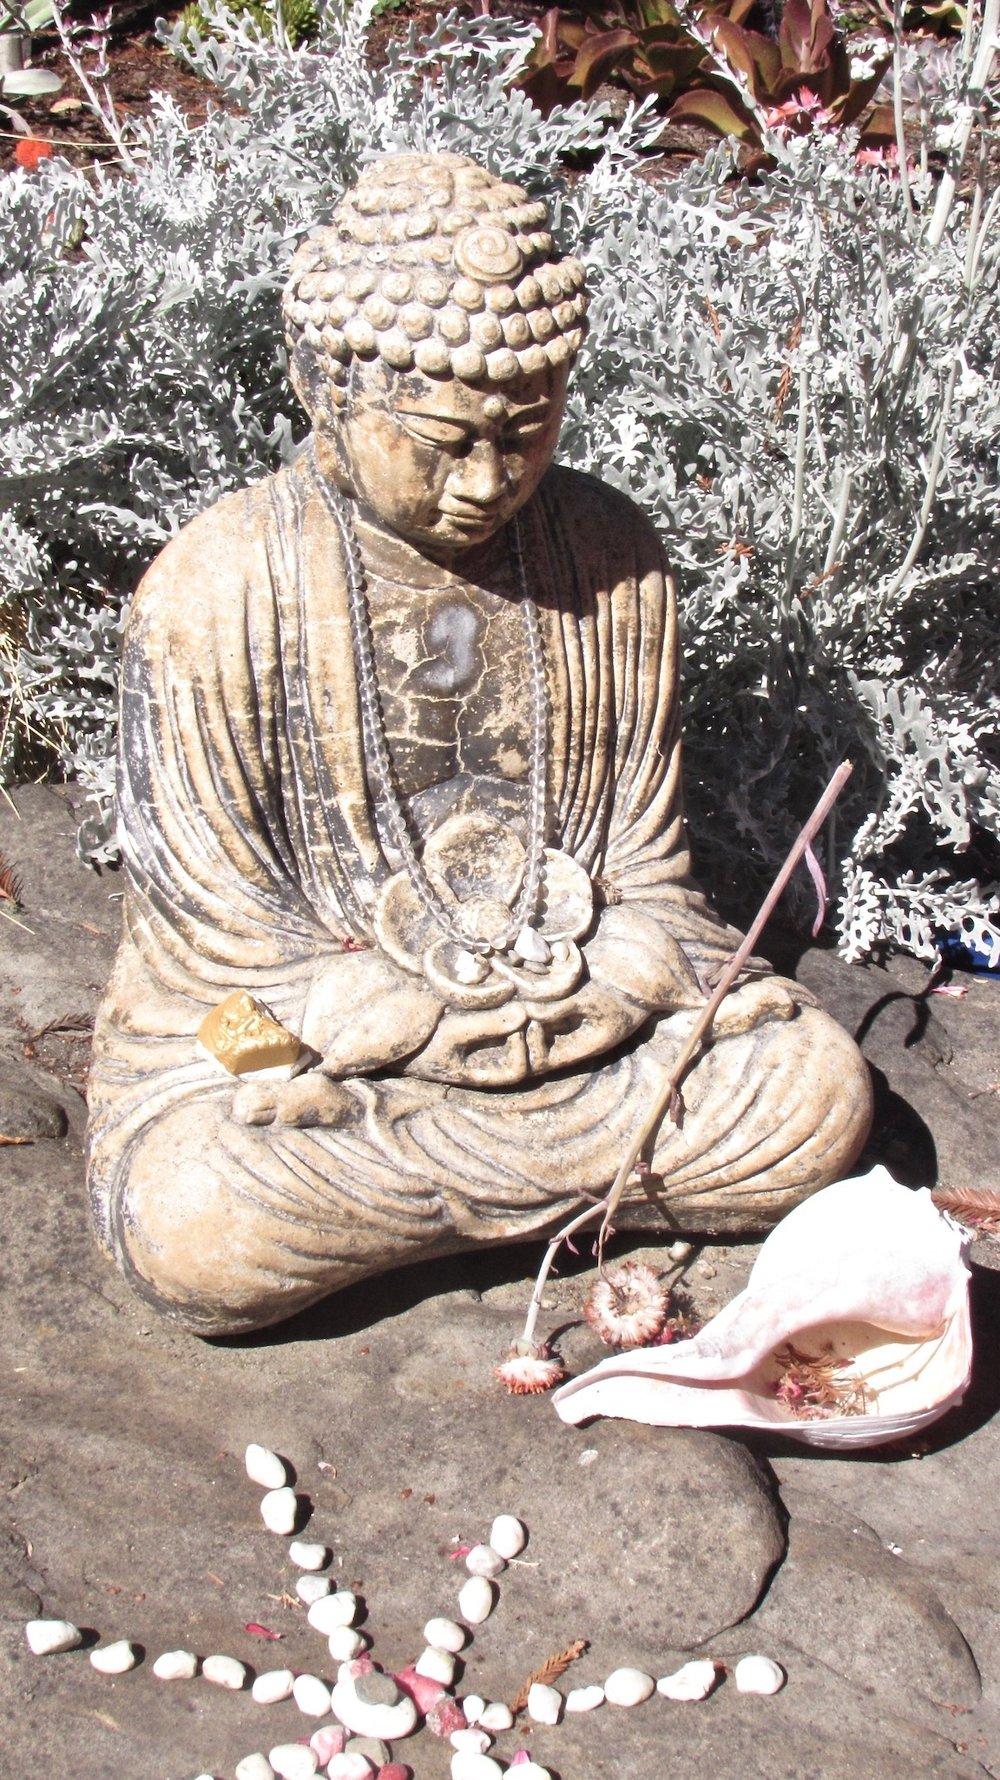 Handmade Spiritual Jewelry, Land of Medicine Buddha, Handmade Bohemian Jewelry